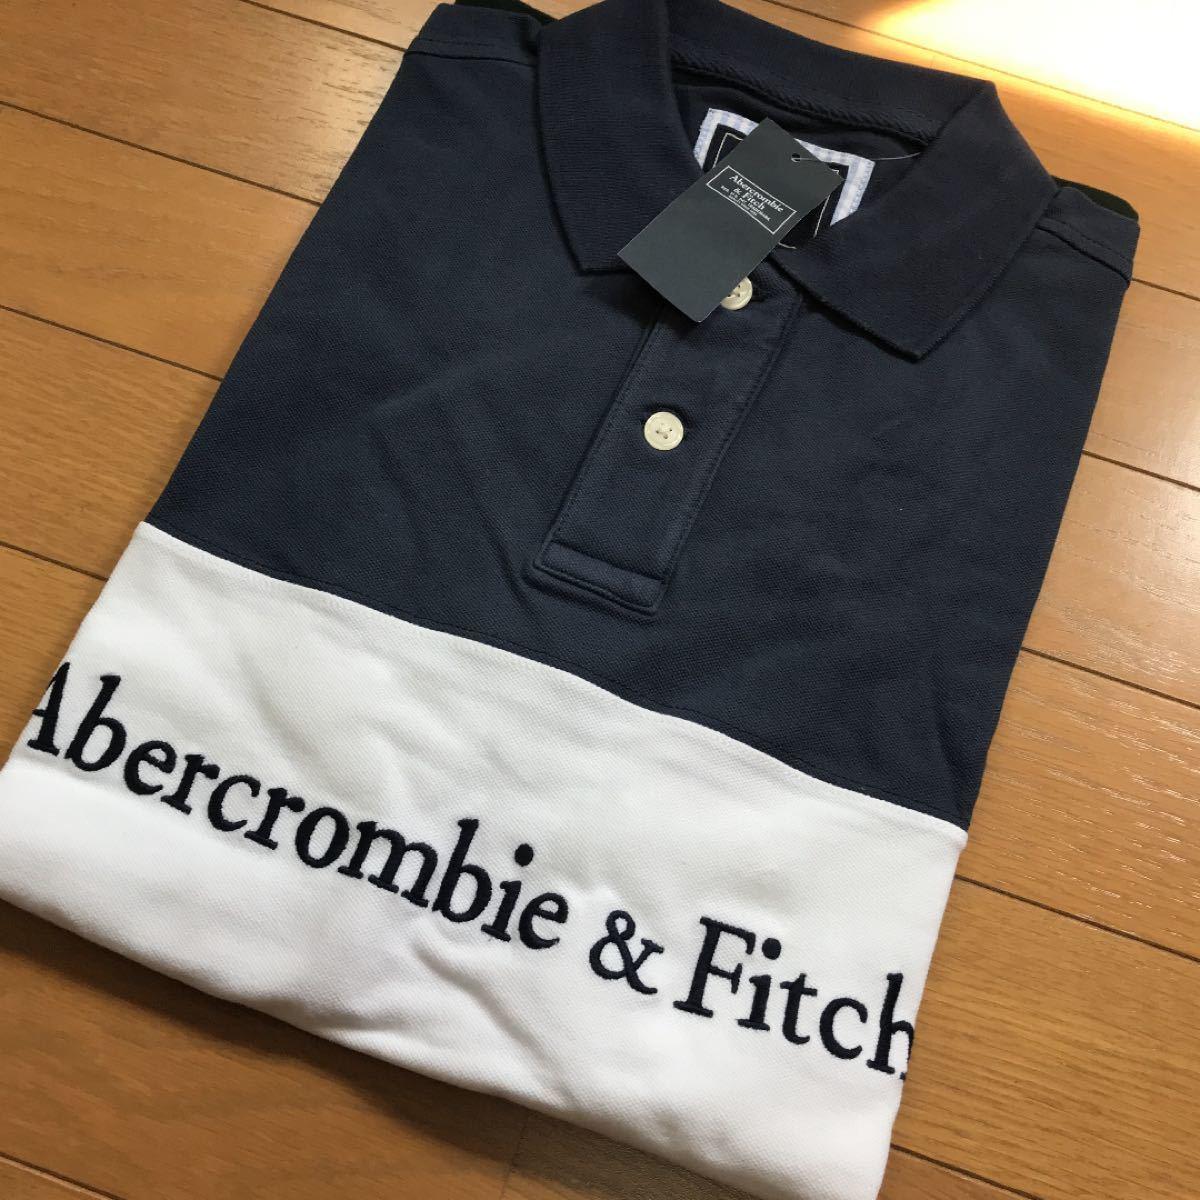 ◎S◎新品正規品◎アバクロ◎ポロシャツ◎送料込